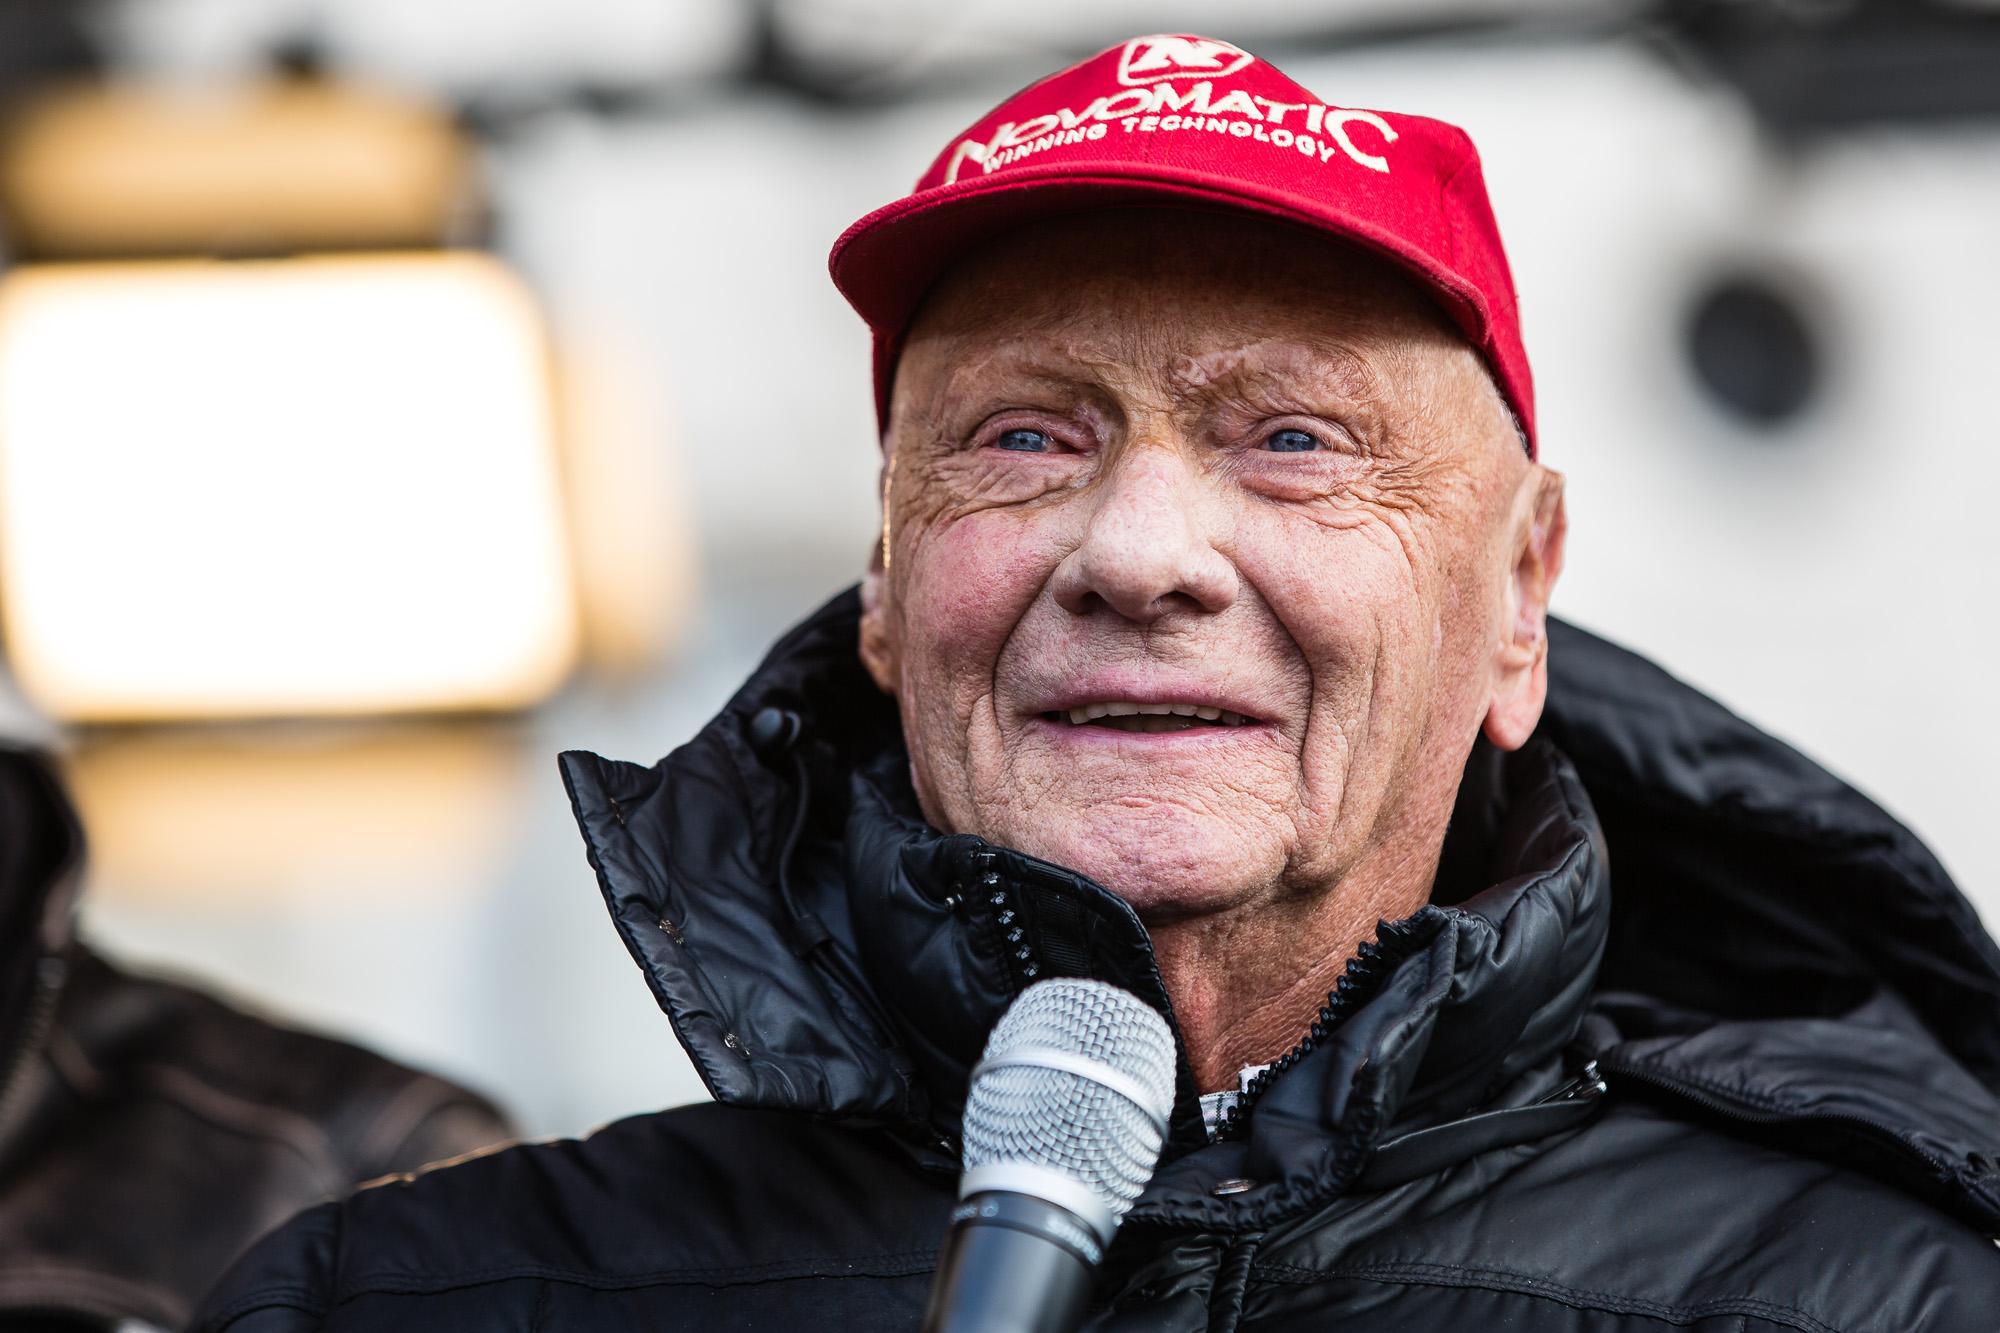 Niki Lauda, Formula 1 icon, dies aged 70